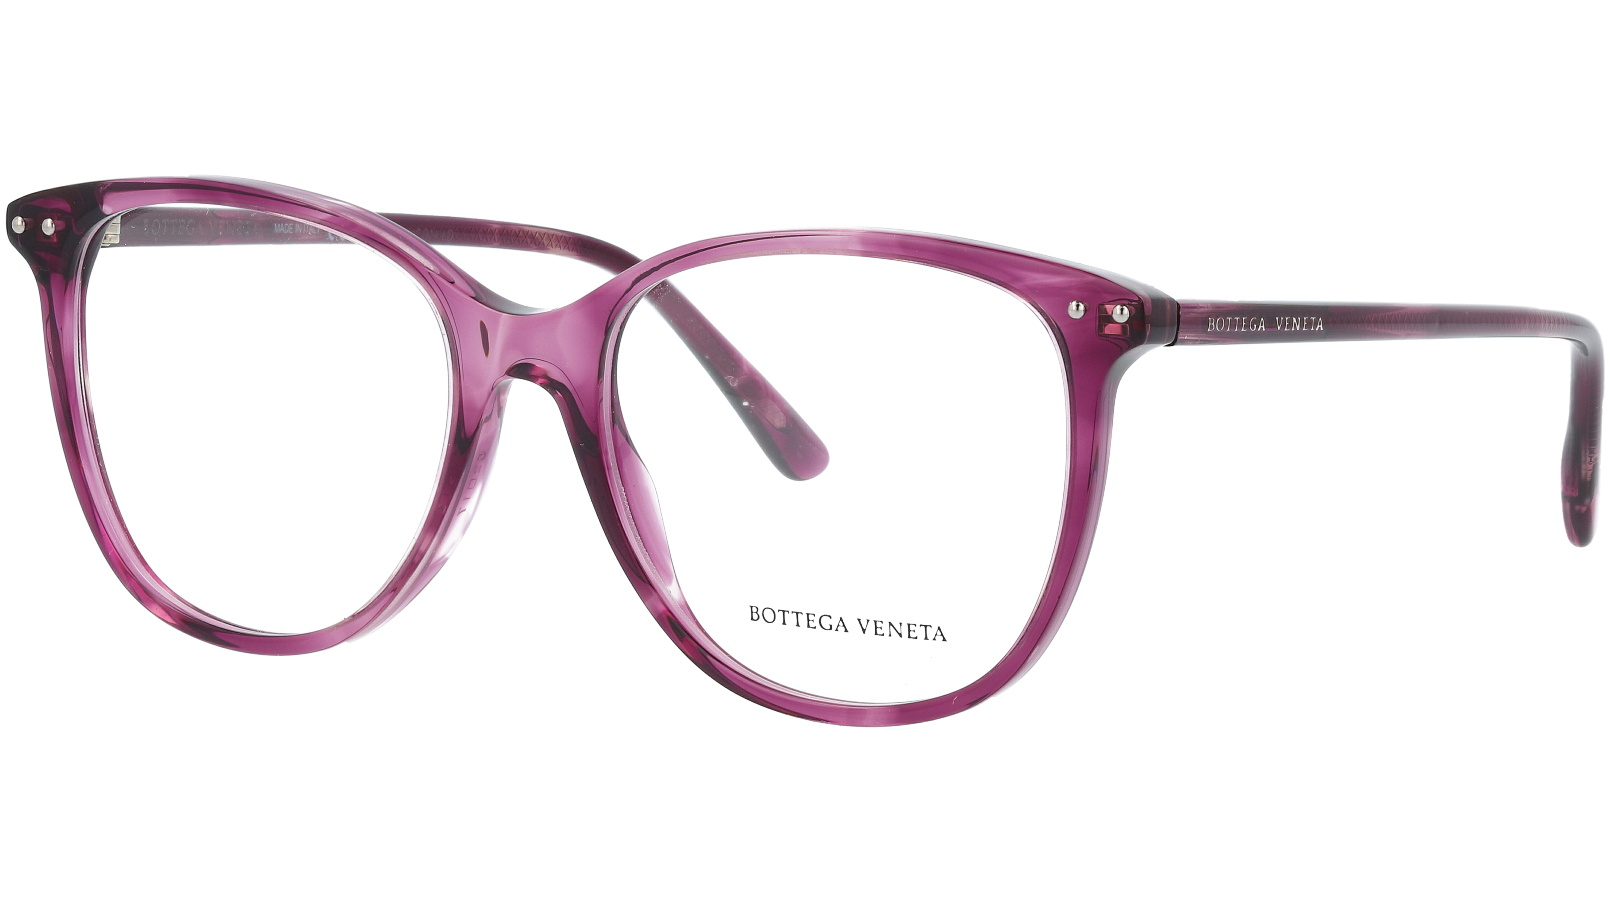 BOTTEGA VENETA BV0161O 003 52 VIOLET Glasses